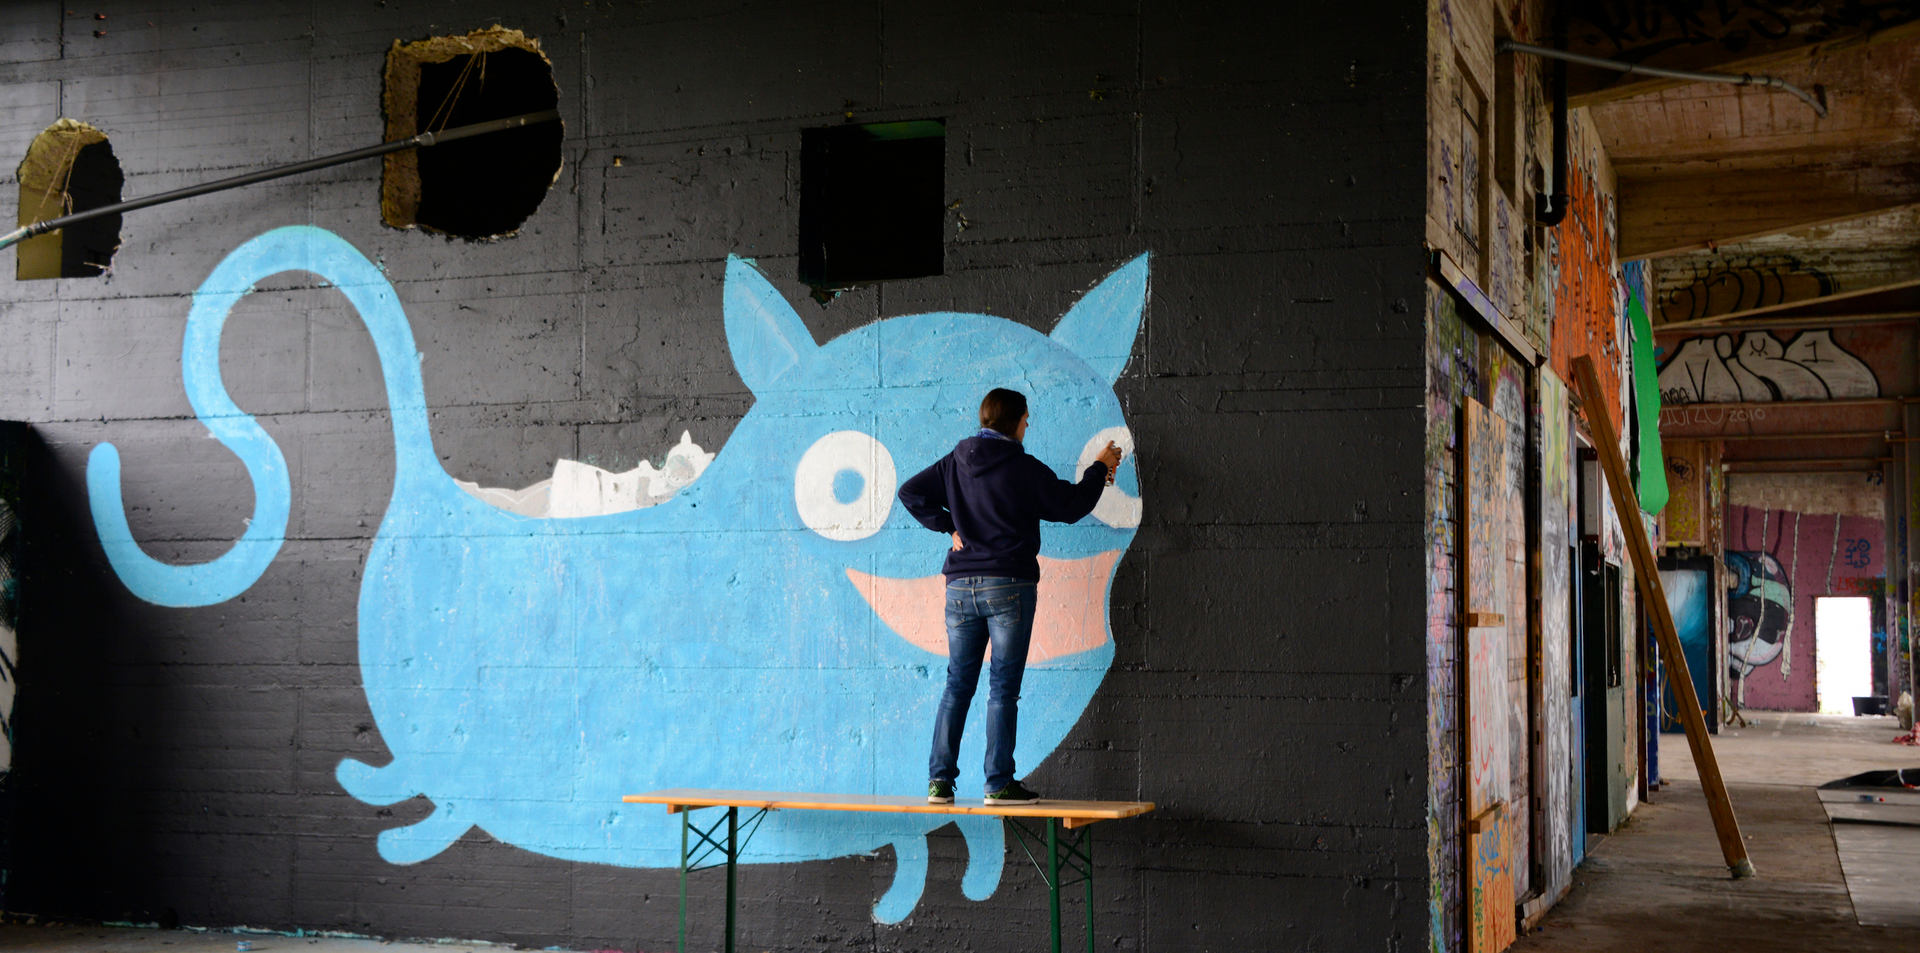 Artist: Taina (CH) | Unser Stilbruchfestival at Berlin Teufelsberg 2017| Powered by Streetart.Limited und Molotow